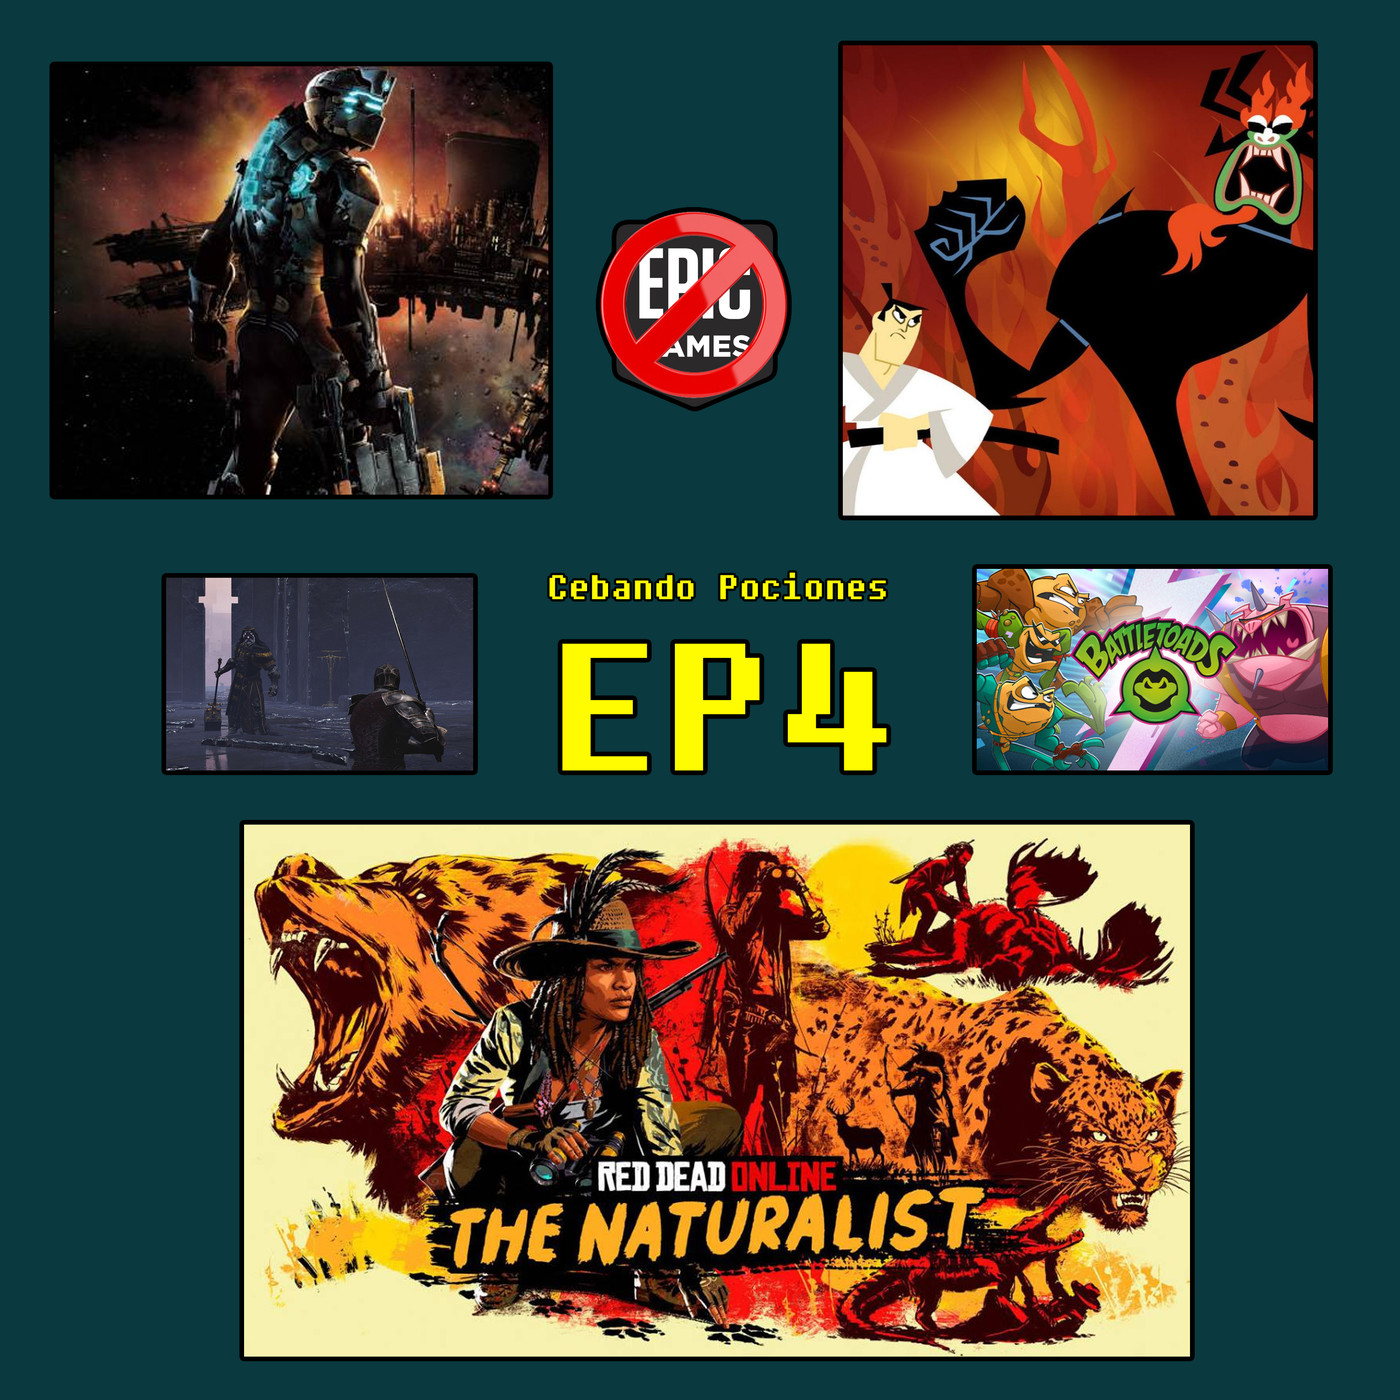 Episodio 4 - RDR Online el Naturalista, Epic en problemas, Ghost Of Tsushima Online?